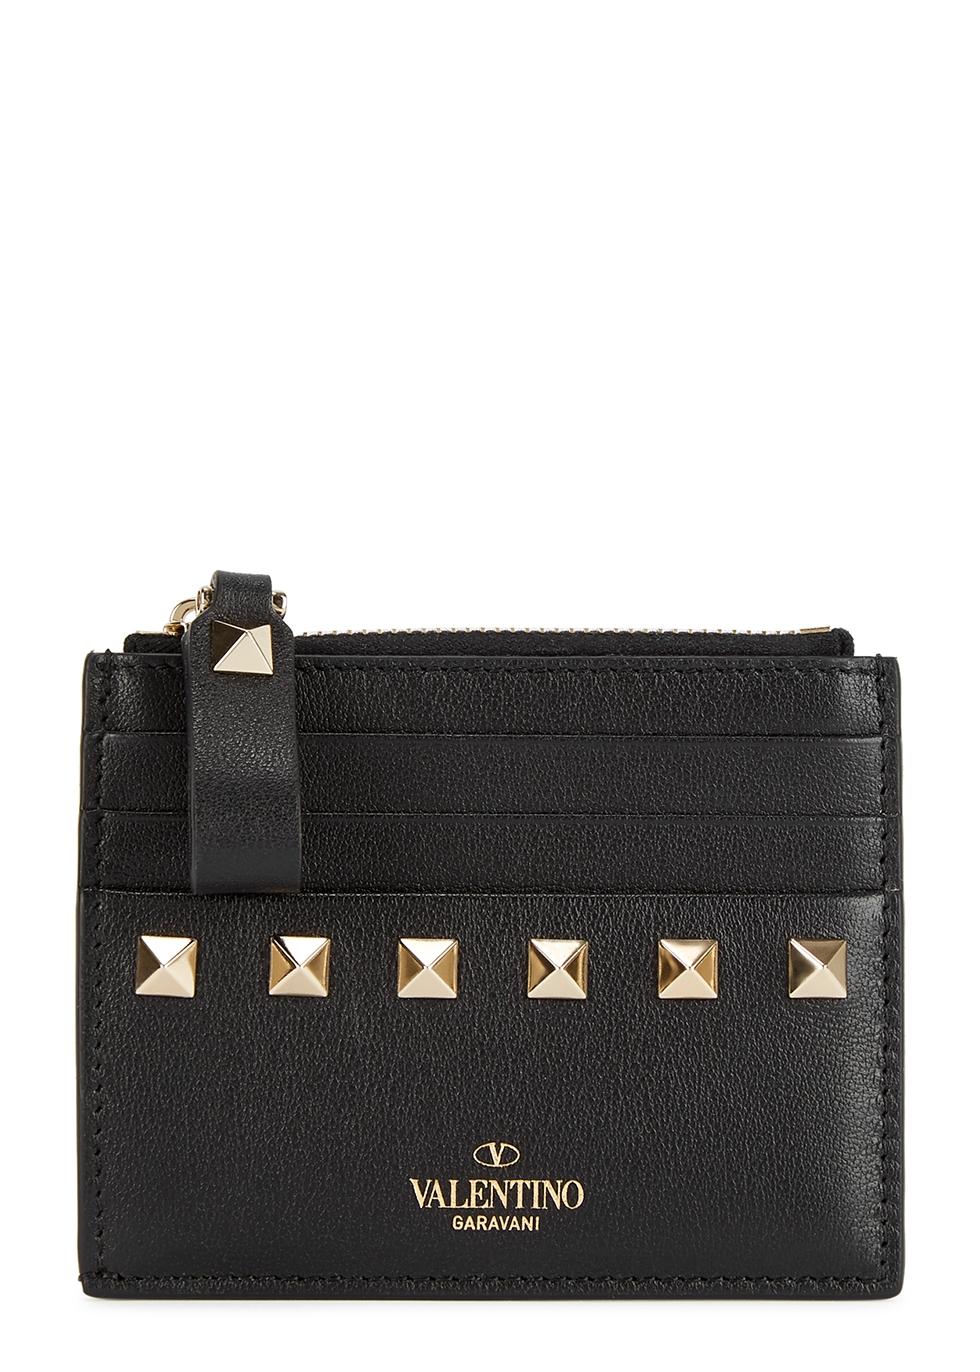 Valentino Garavani Rockstud black leather card holder